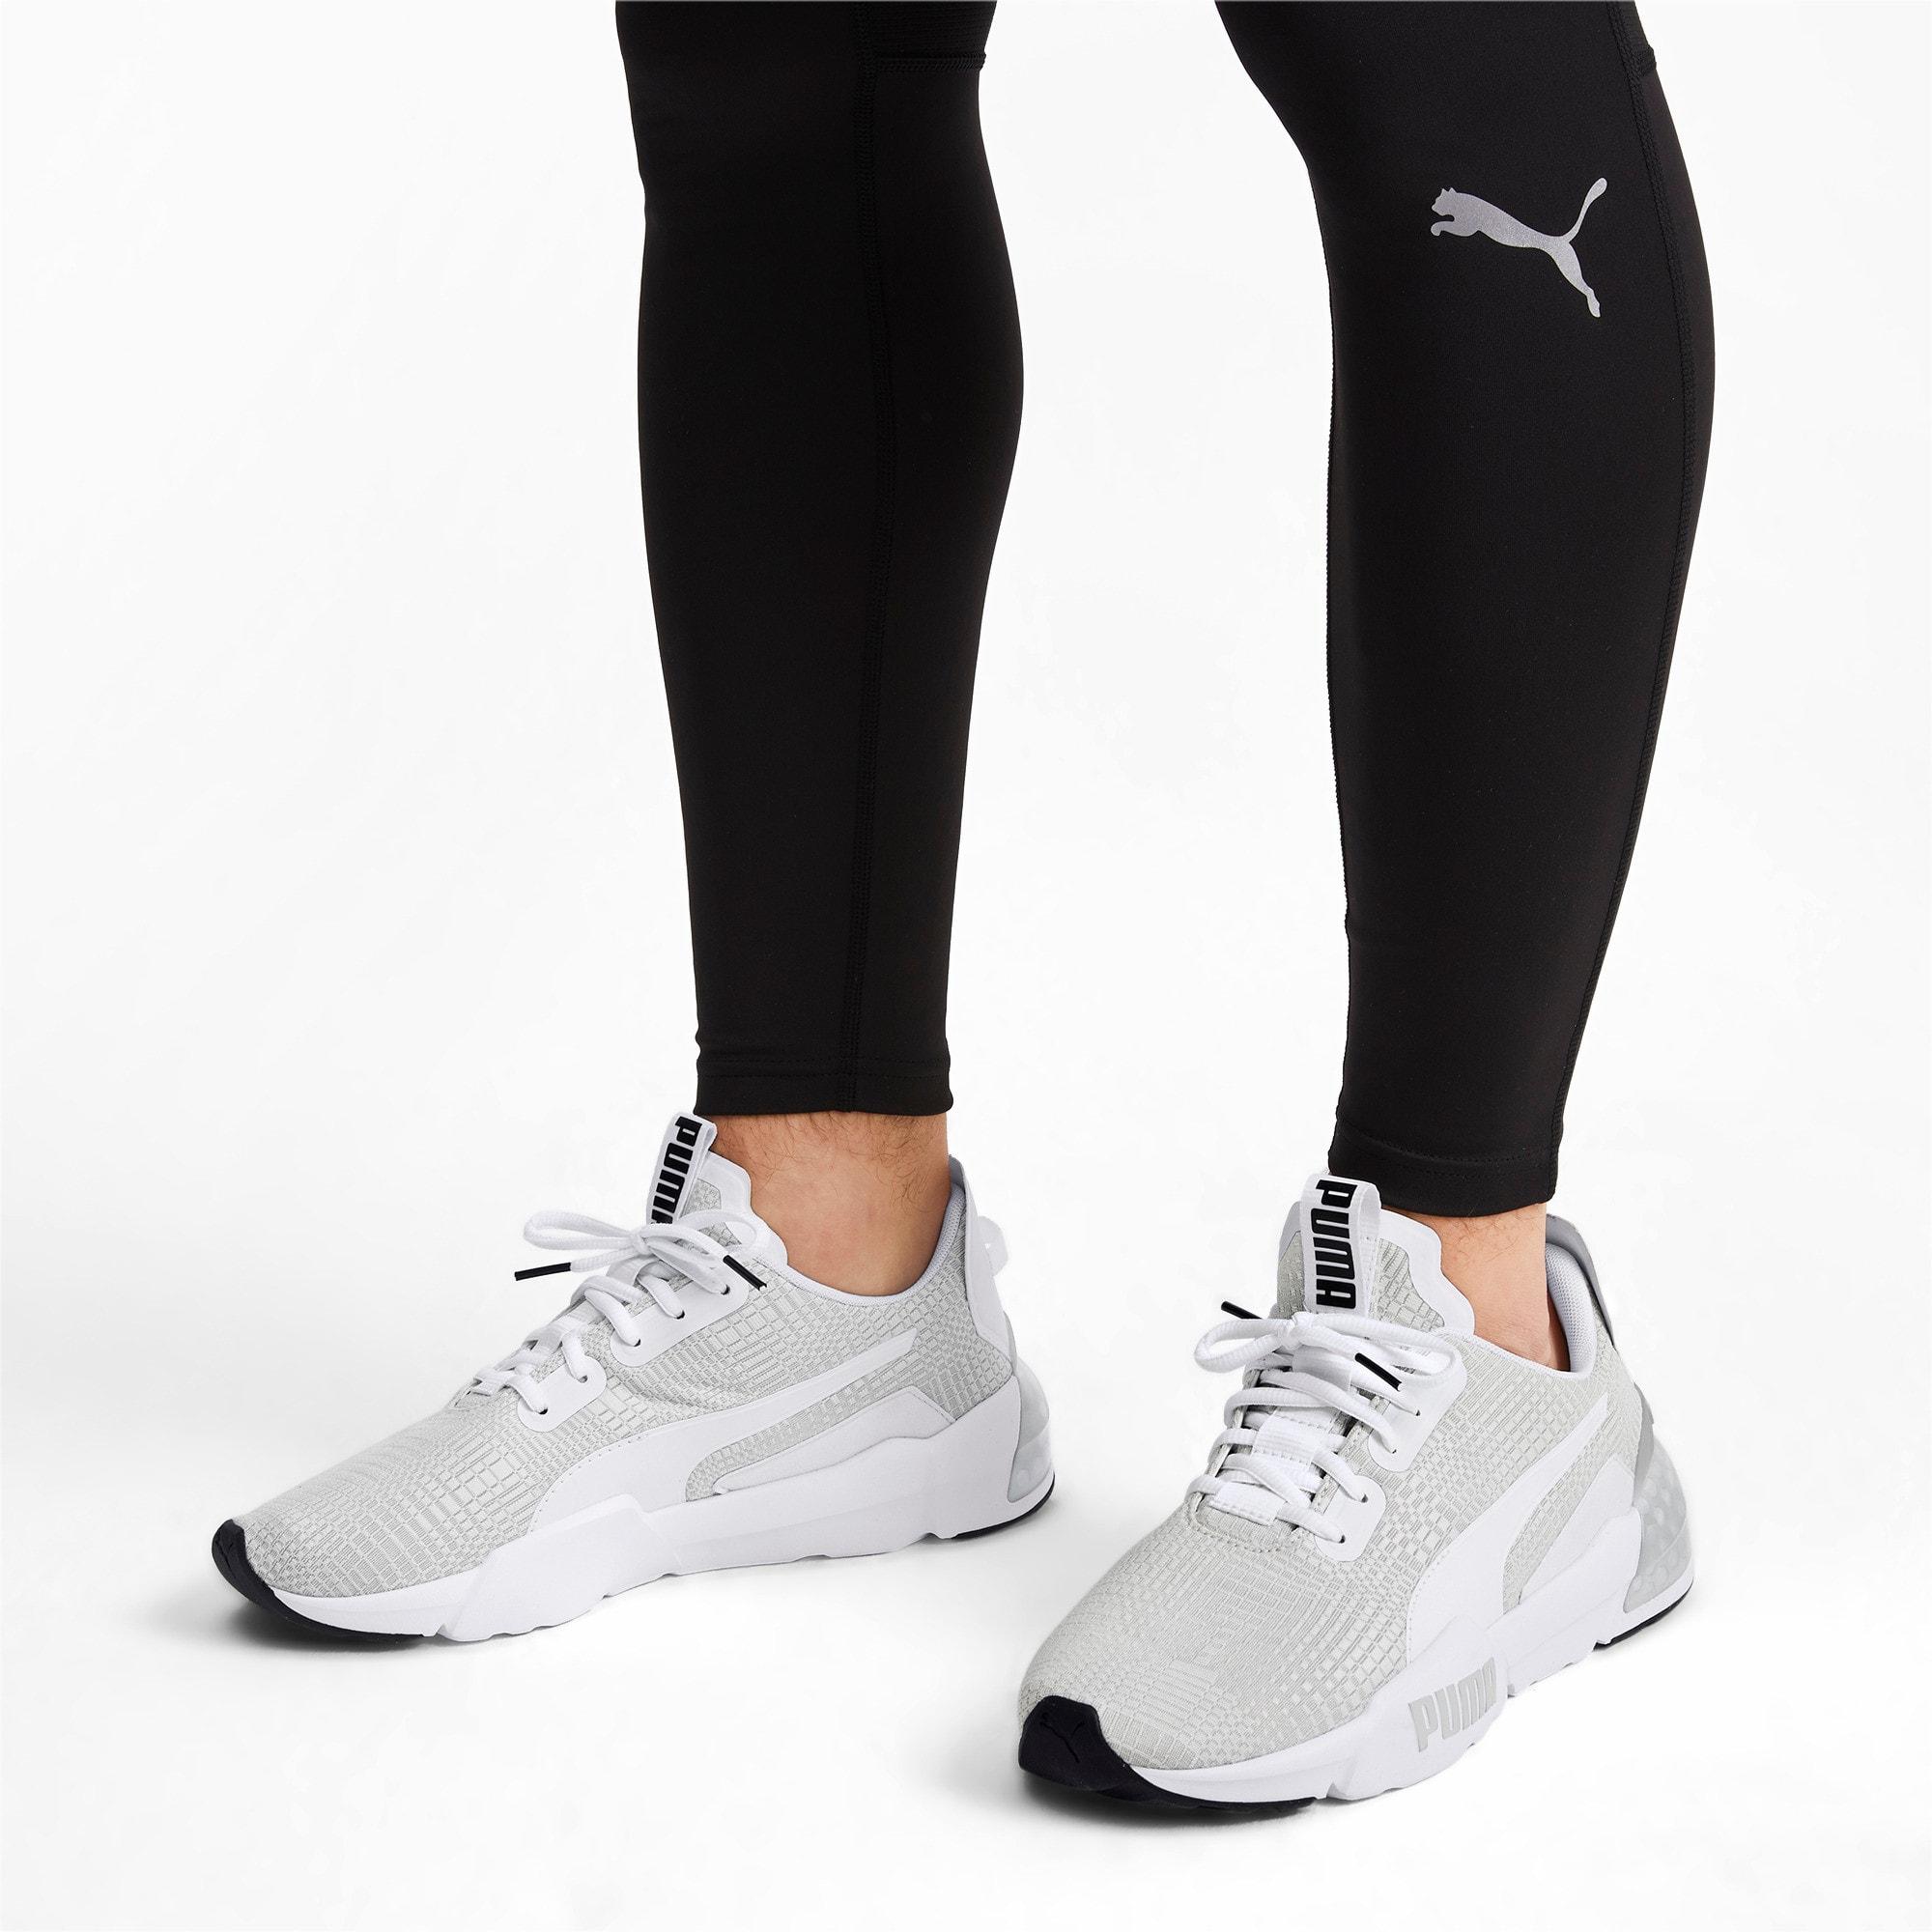 Thumbnail 2 of CELL Phase Lights Men's Training Shoes, Puma White-Gray Violet, medium